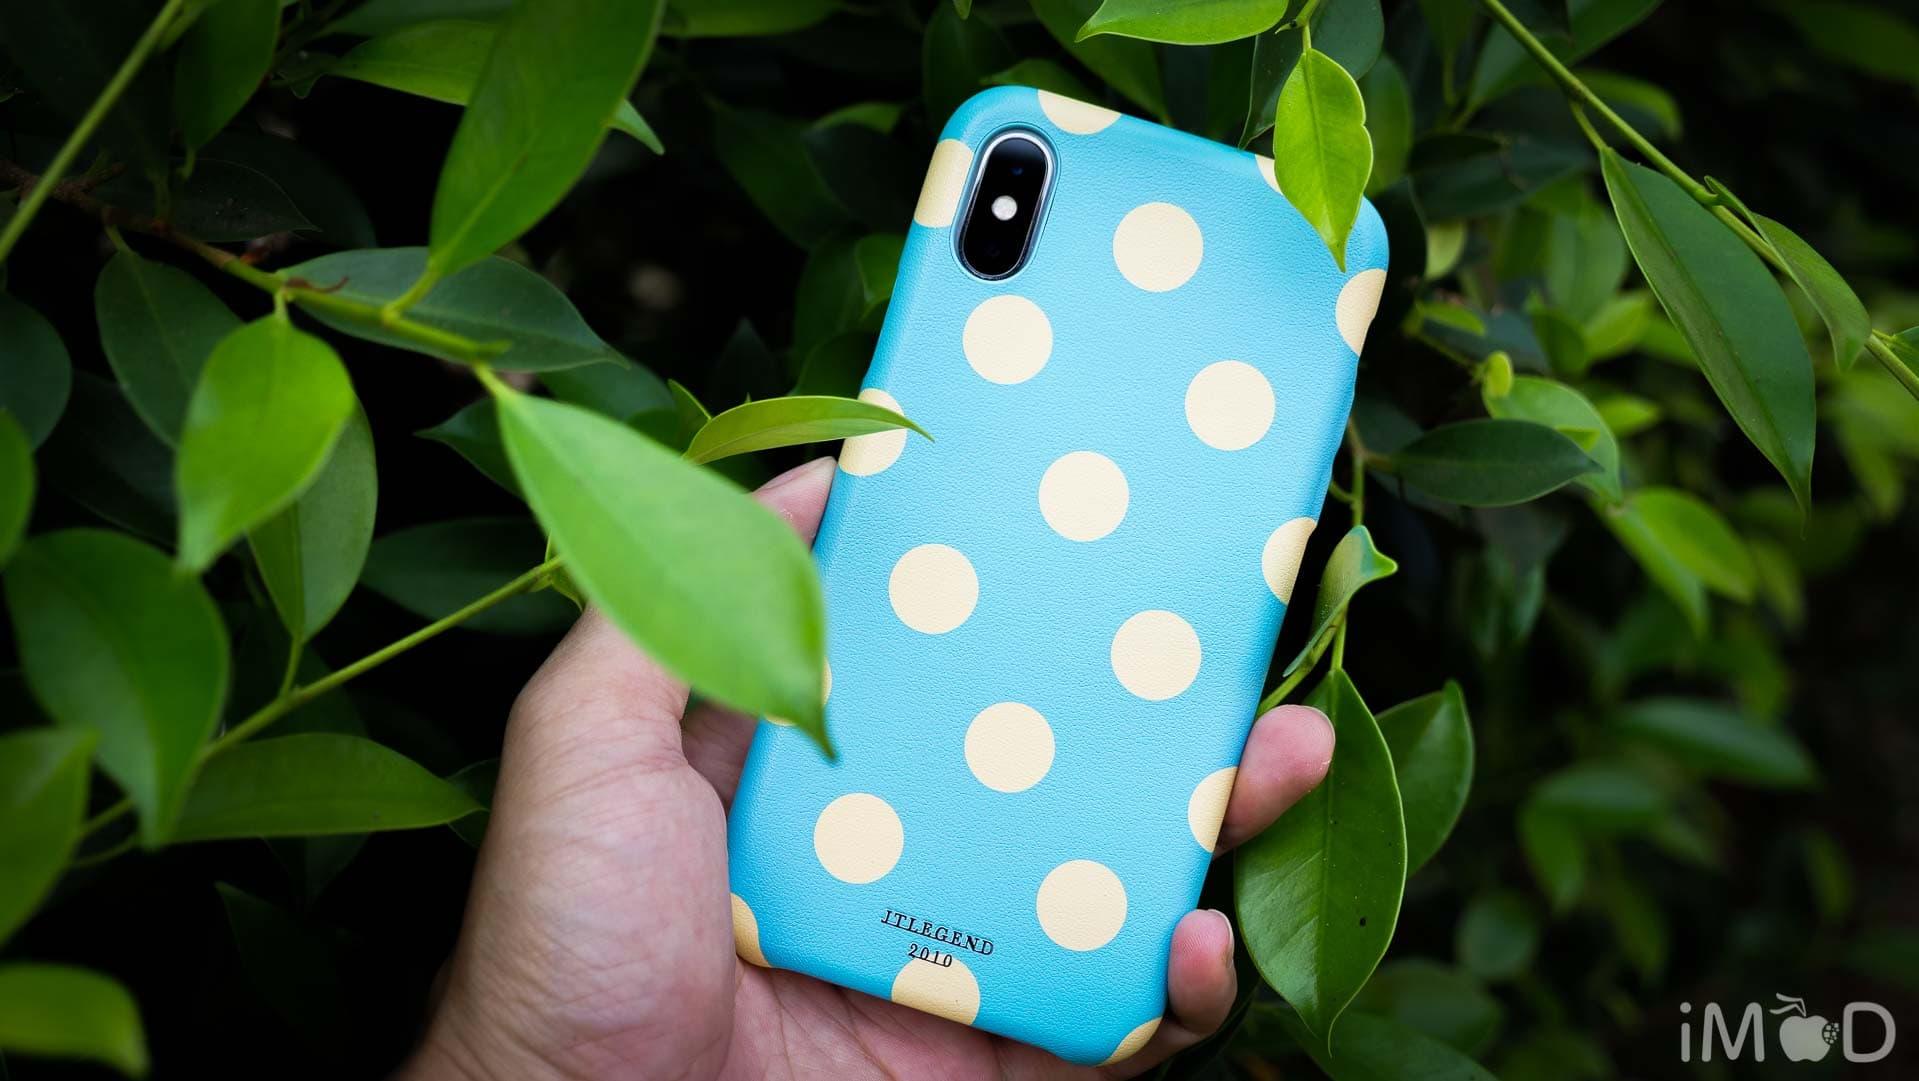 Jtlegend Pokla Leather Case Iphone X 8639